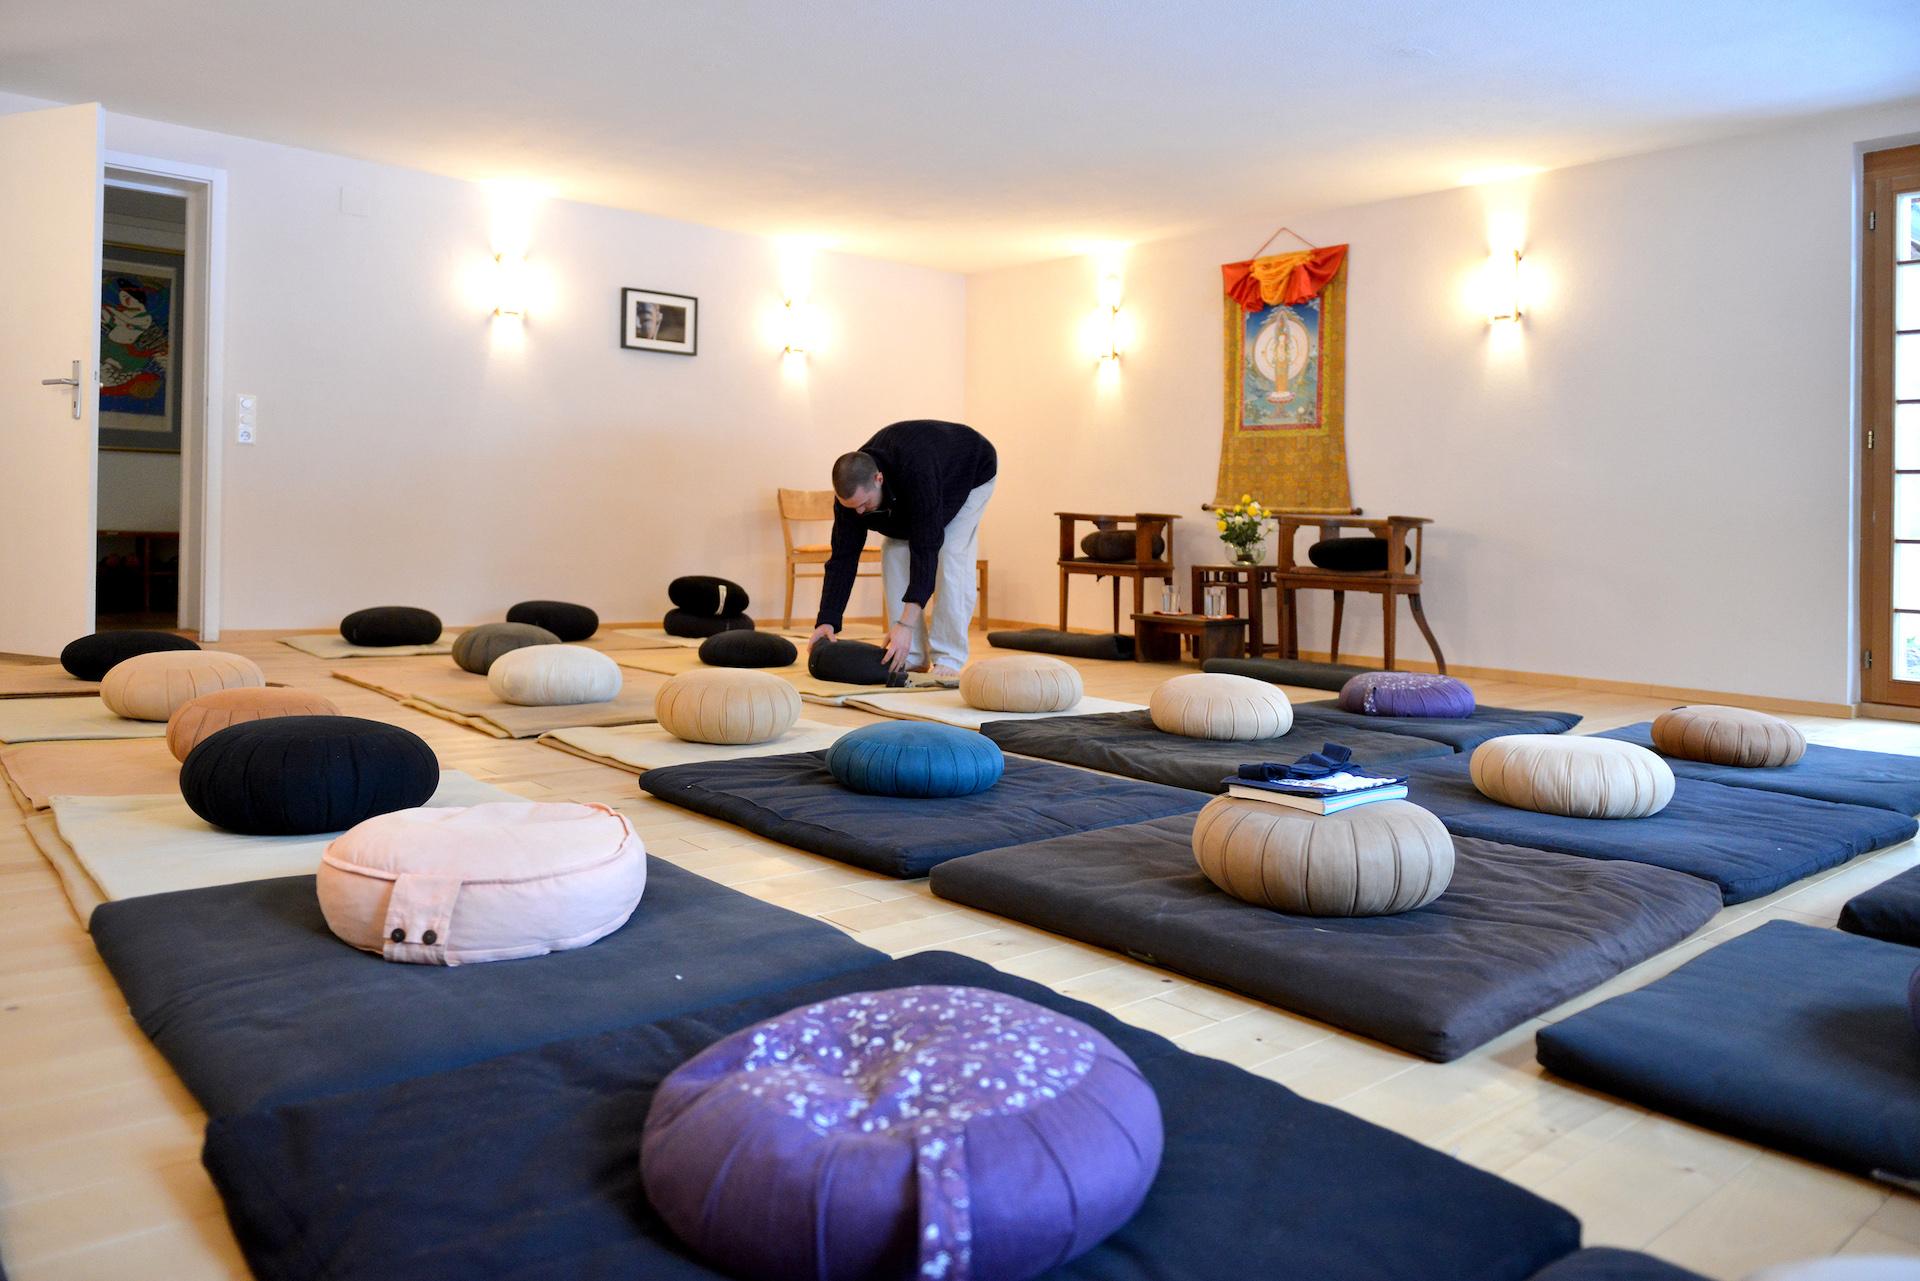 zen zazen meditation johanneshof hotzenhaus dharma sangha baker roshi buddhismus dojo